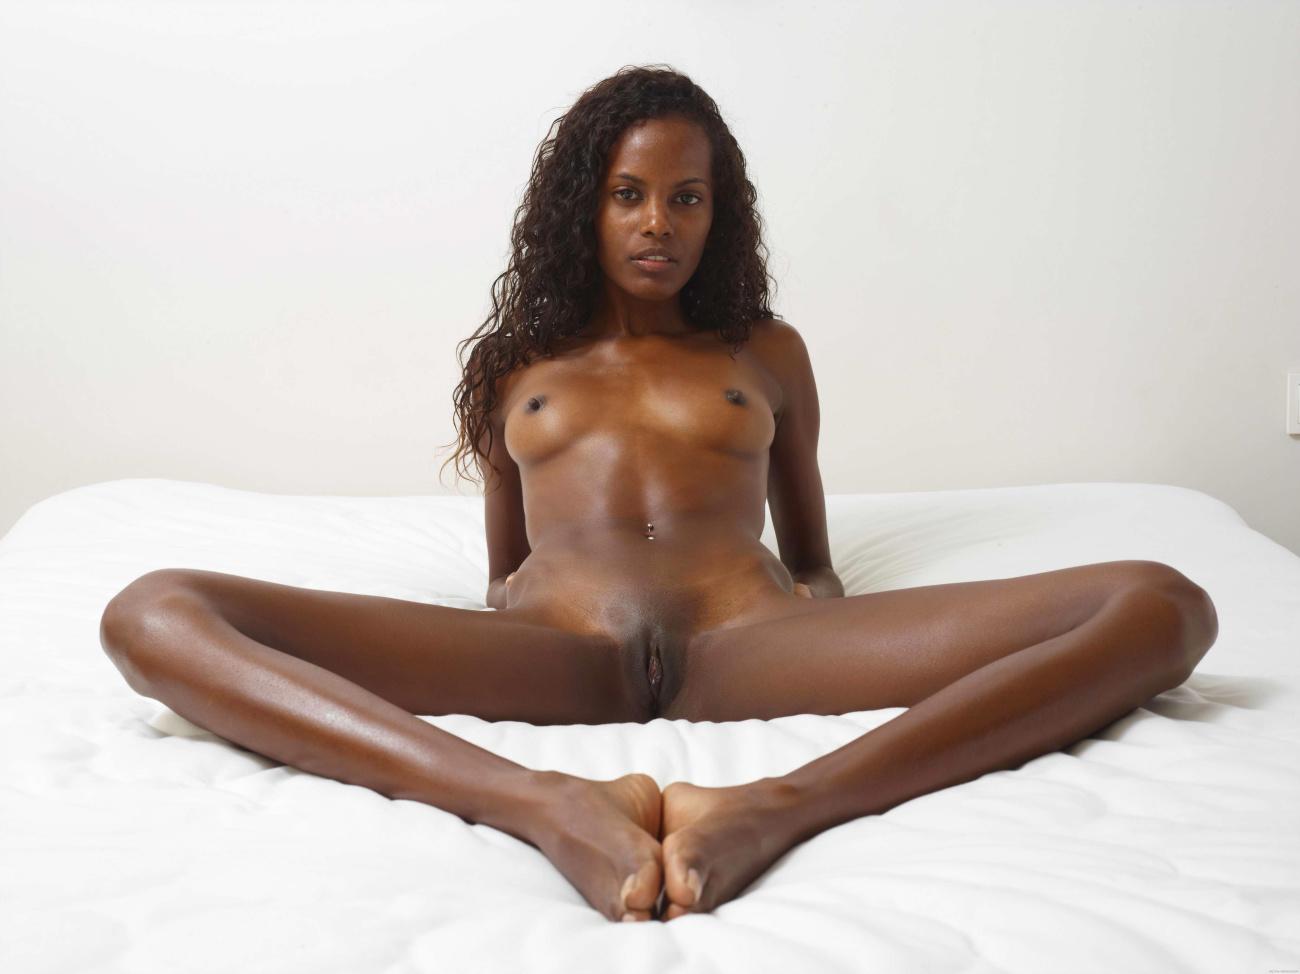 Femme Noire Nue - WallSexy